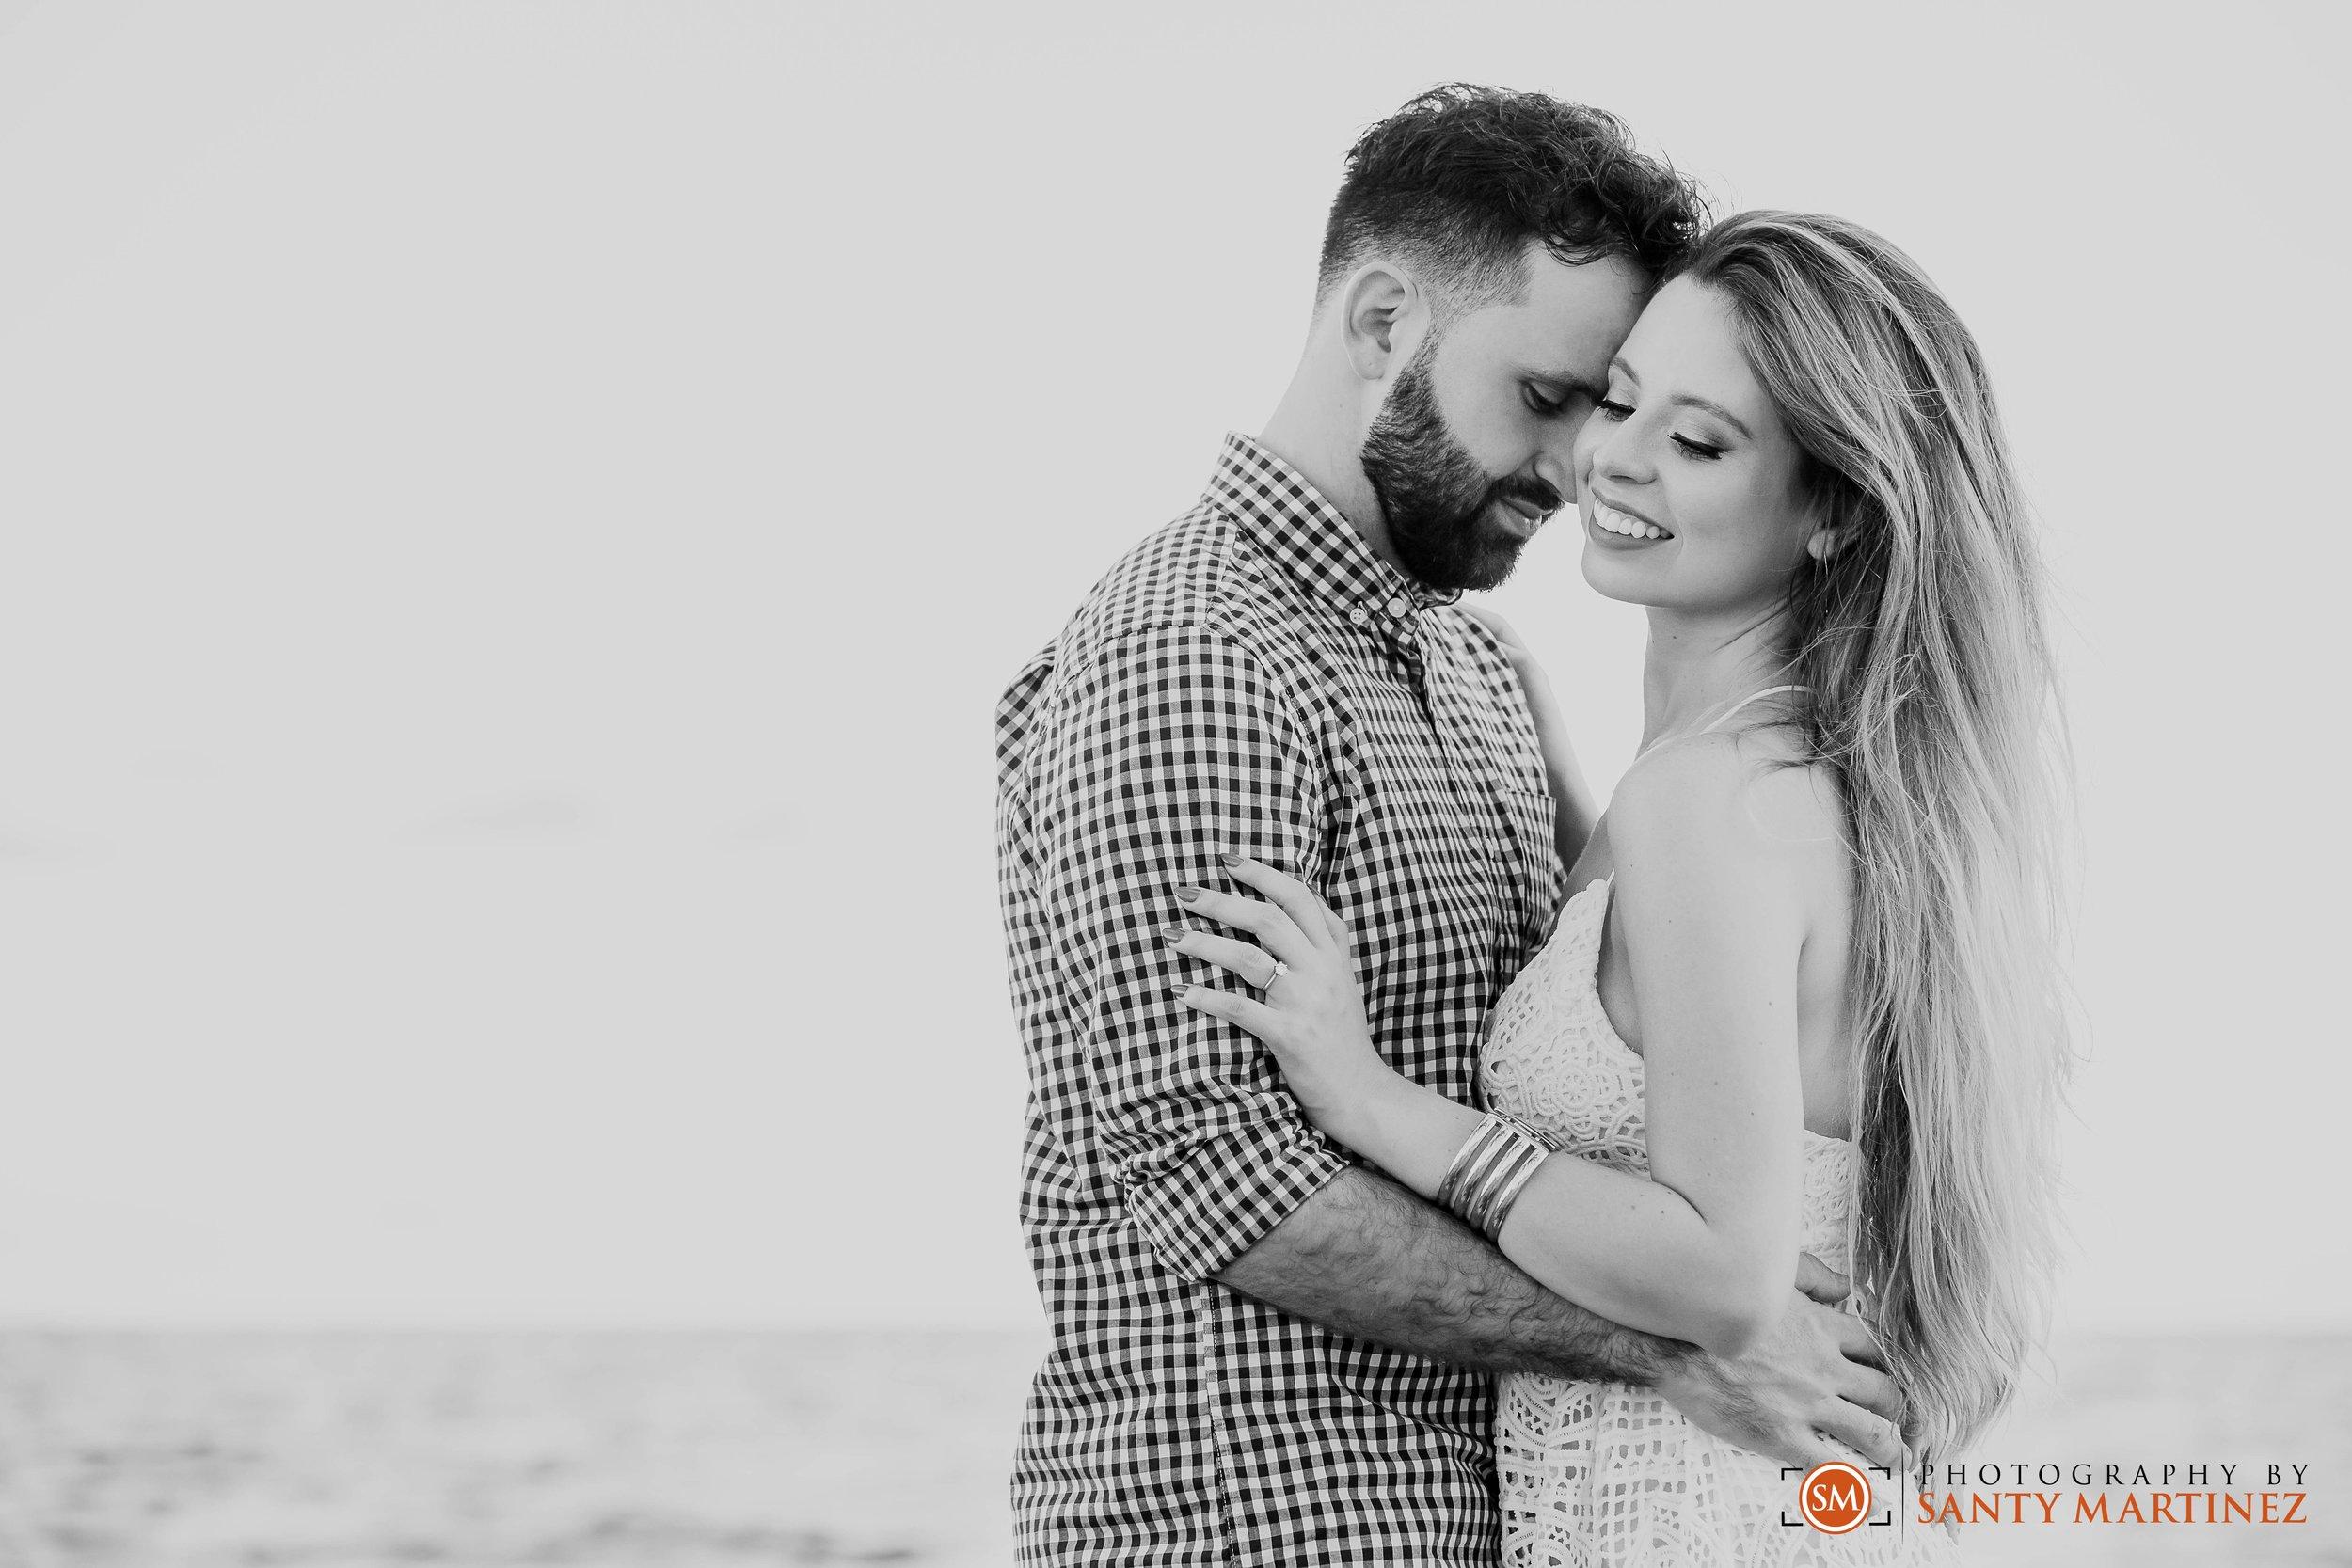 Engagement Session - Matheson Hammock Park - Santy Martinez Wedding Photographer-20.jpg